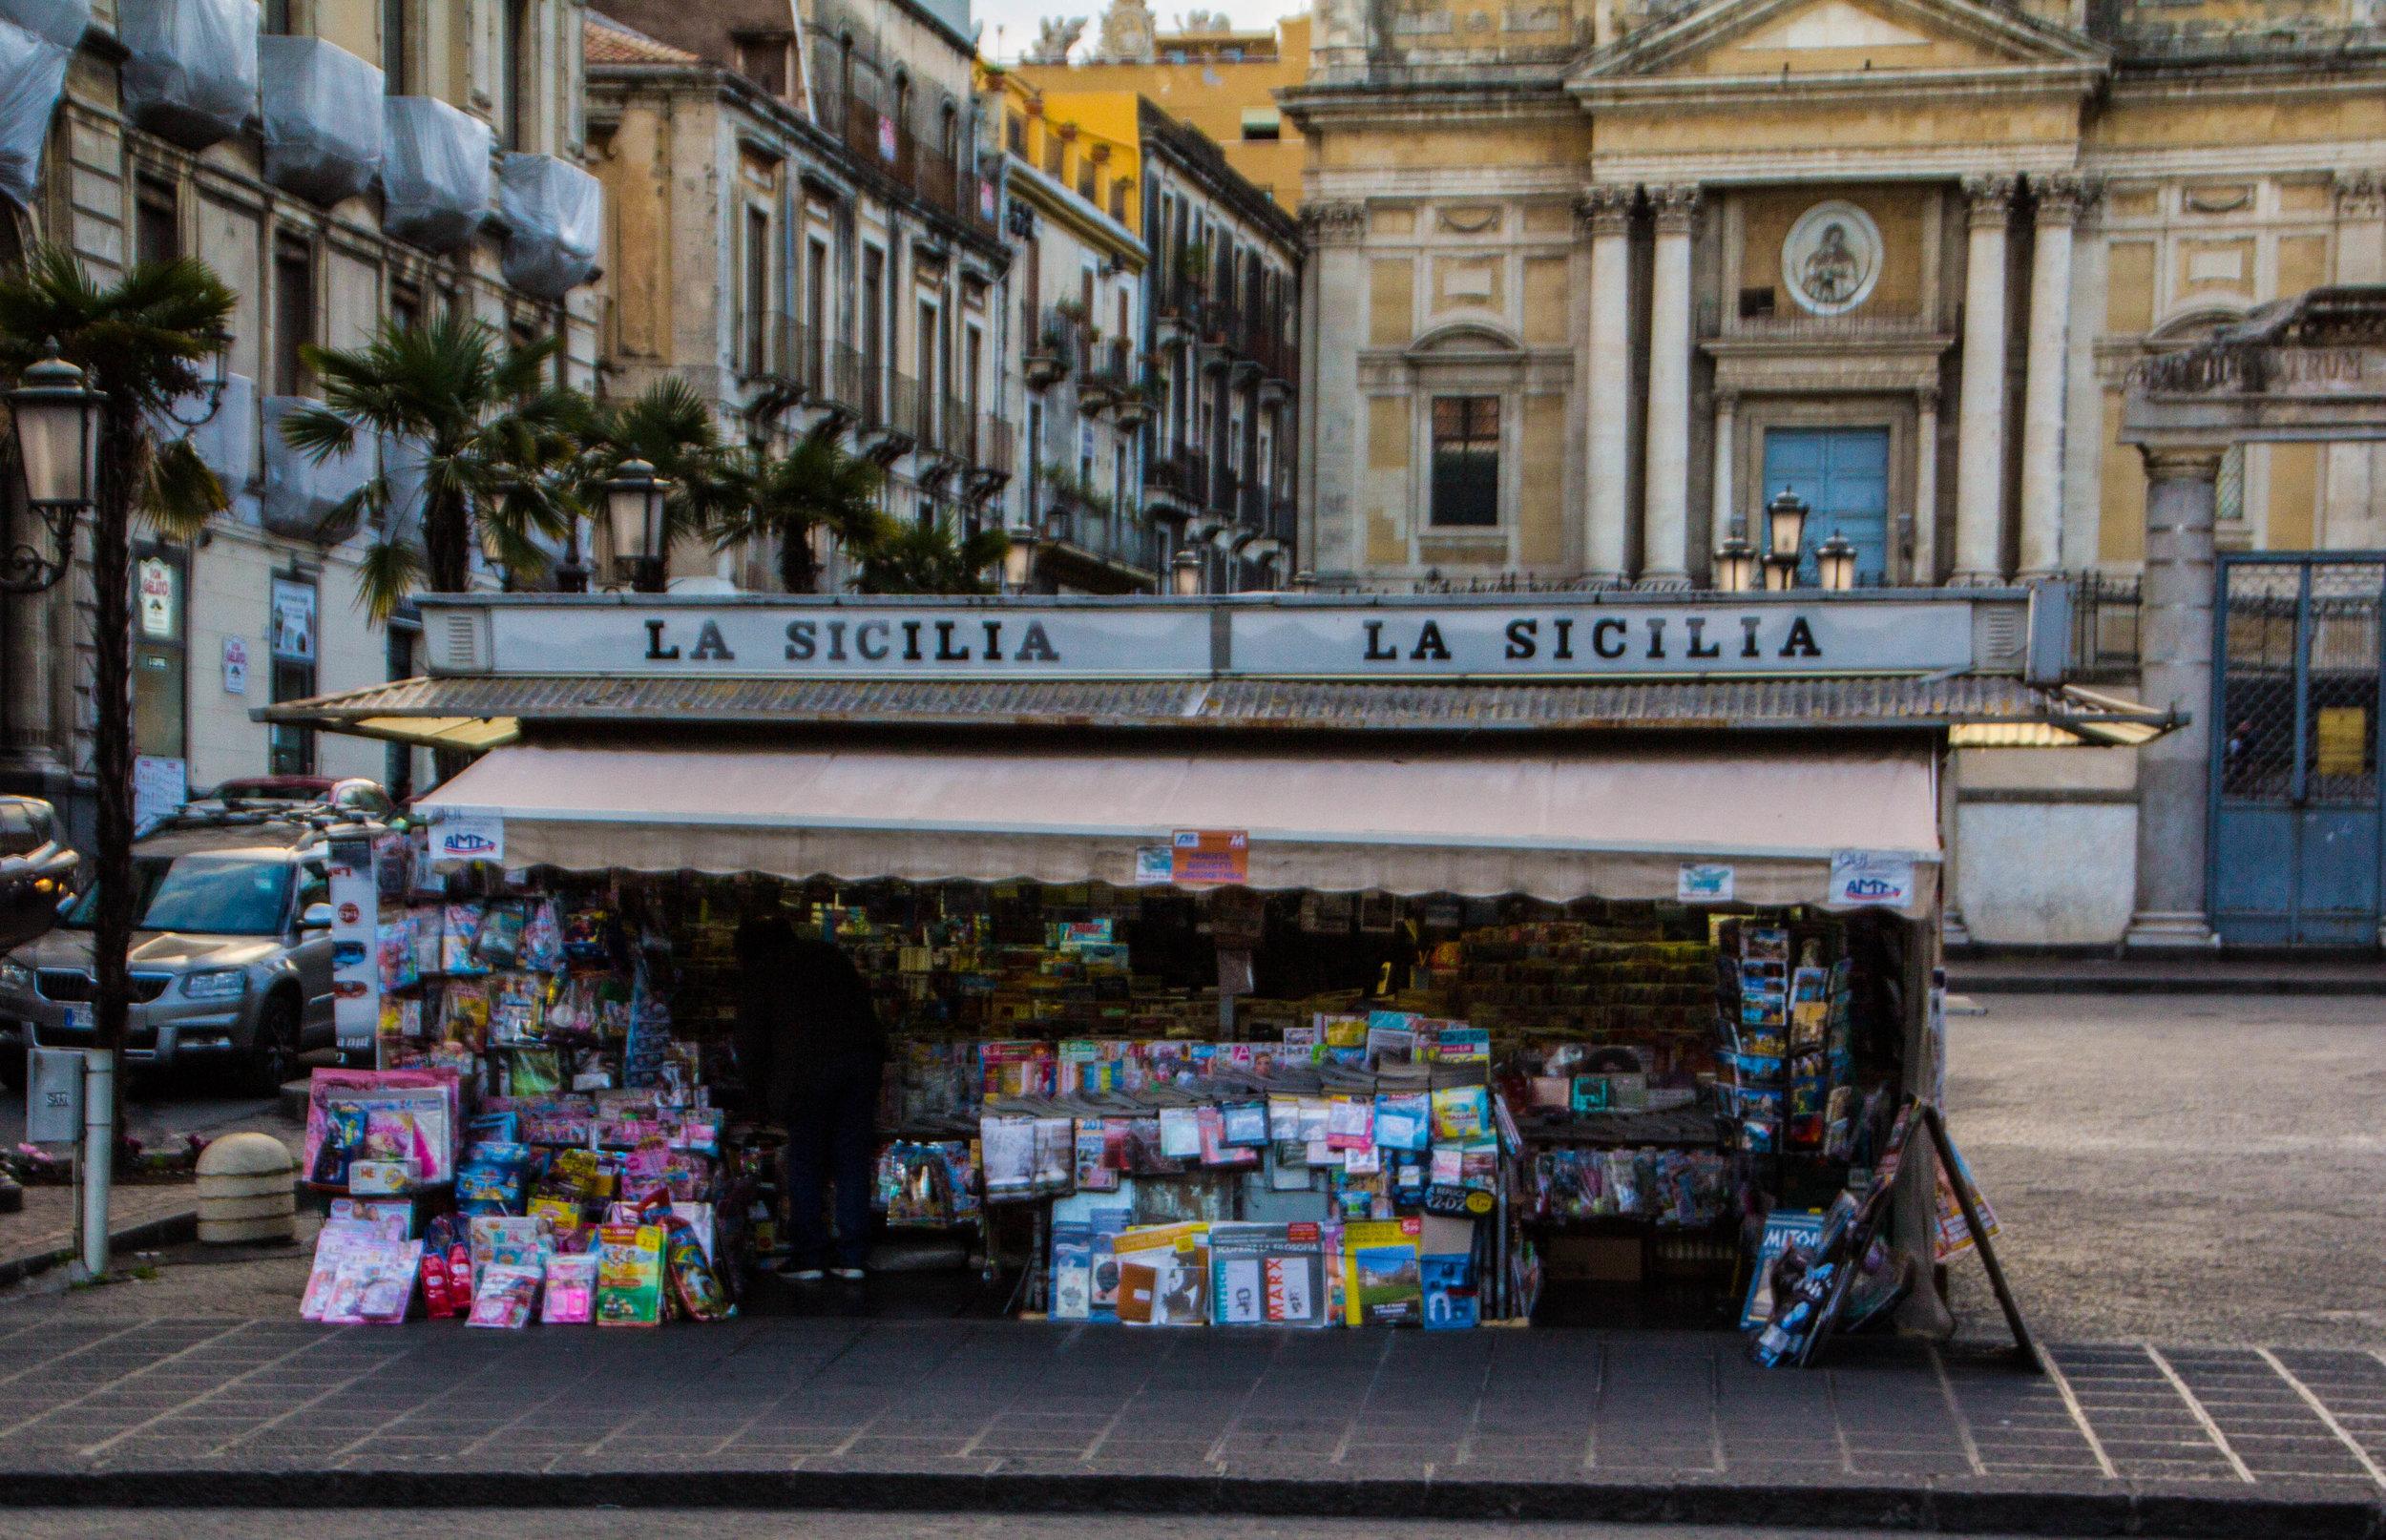 streets-catania-sicily-sicilia-11.jpg